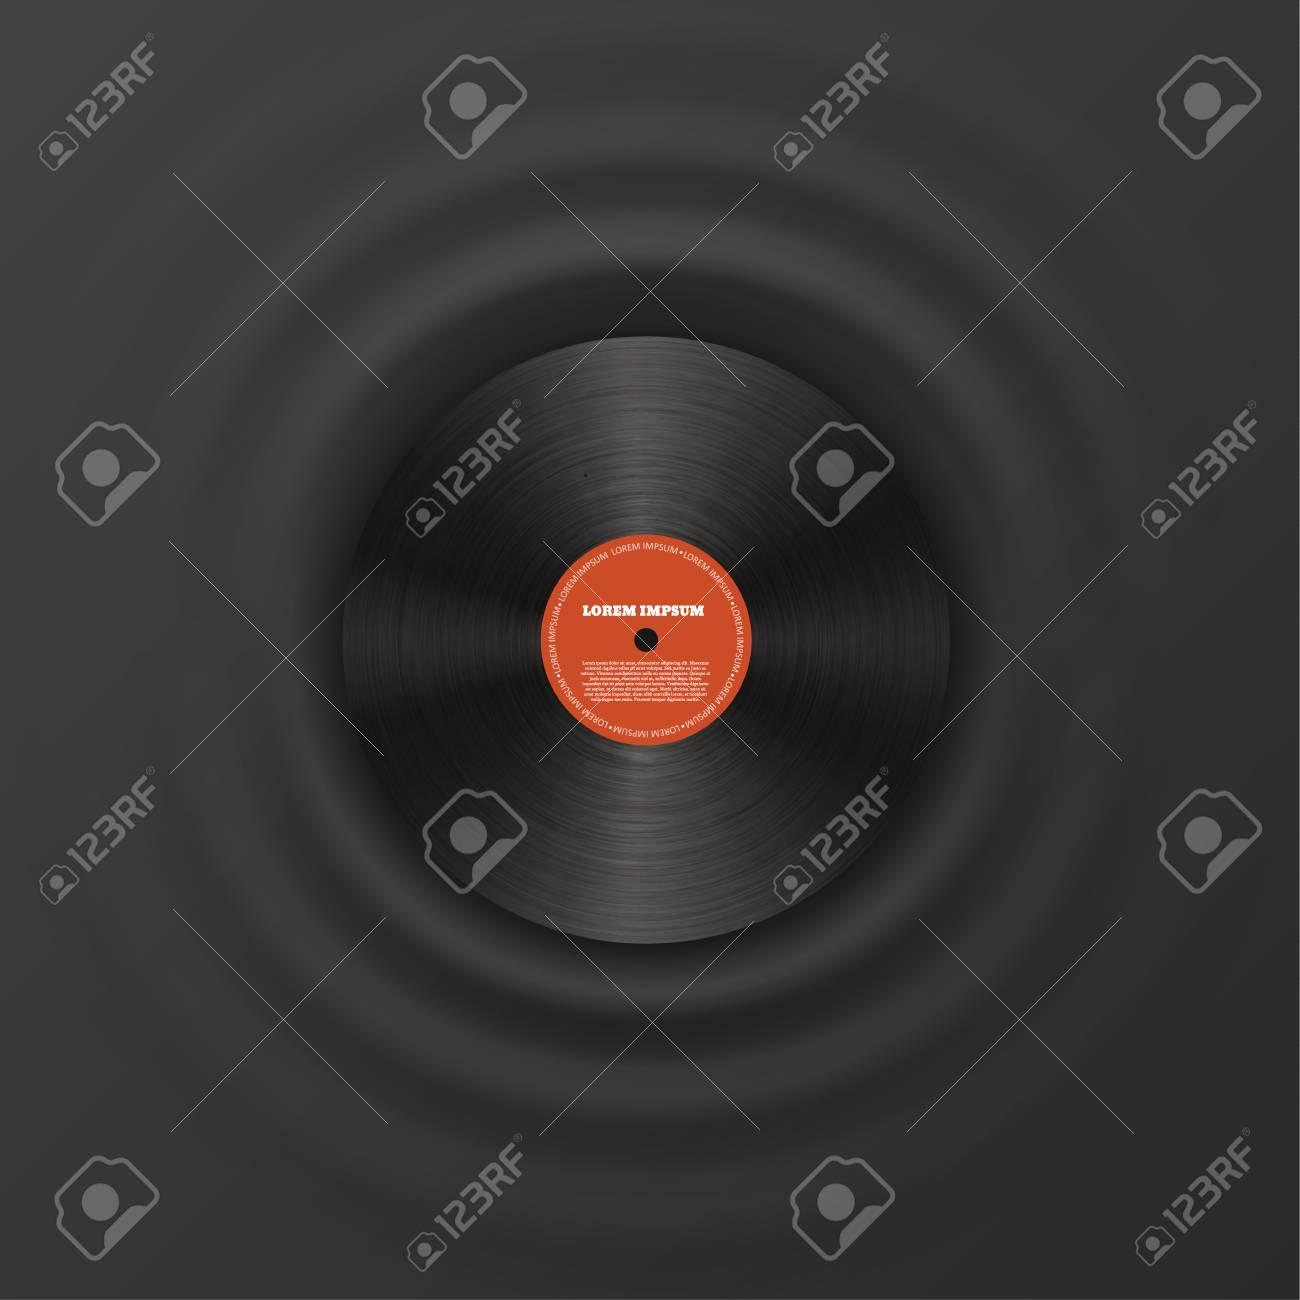 Illustartion of Vinyl disk realistic design eps 10 - 50709928